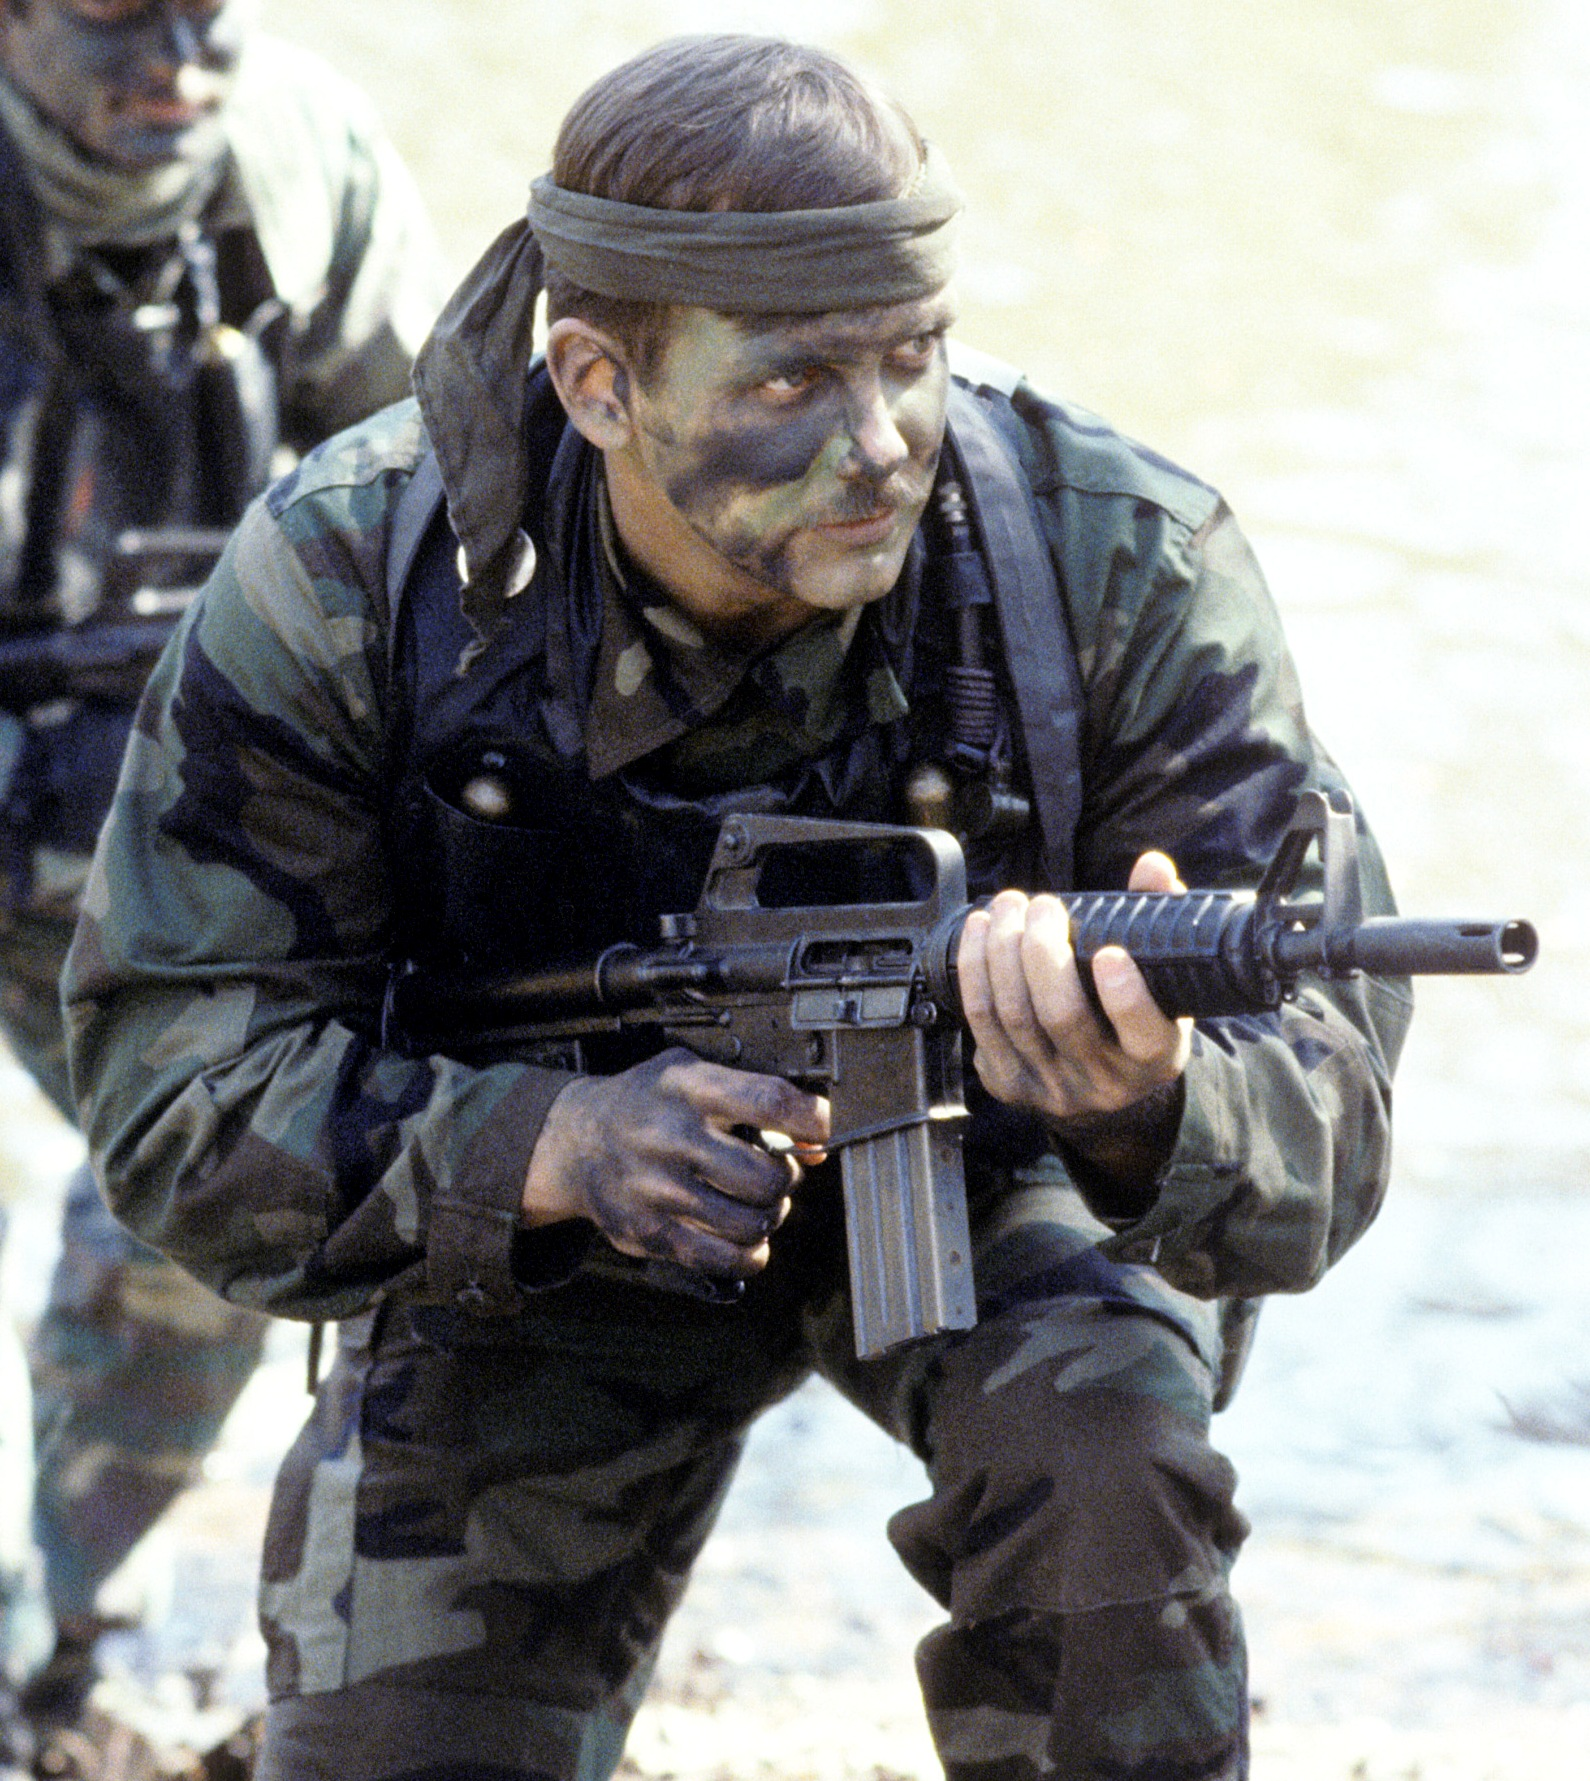 File:SEAL Colt Commando v2.jpg - Wikimedia Commons